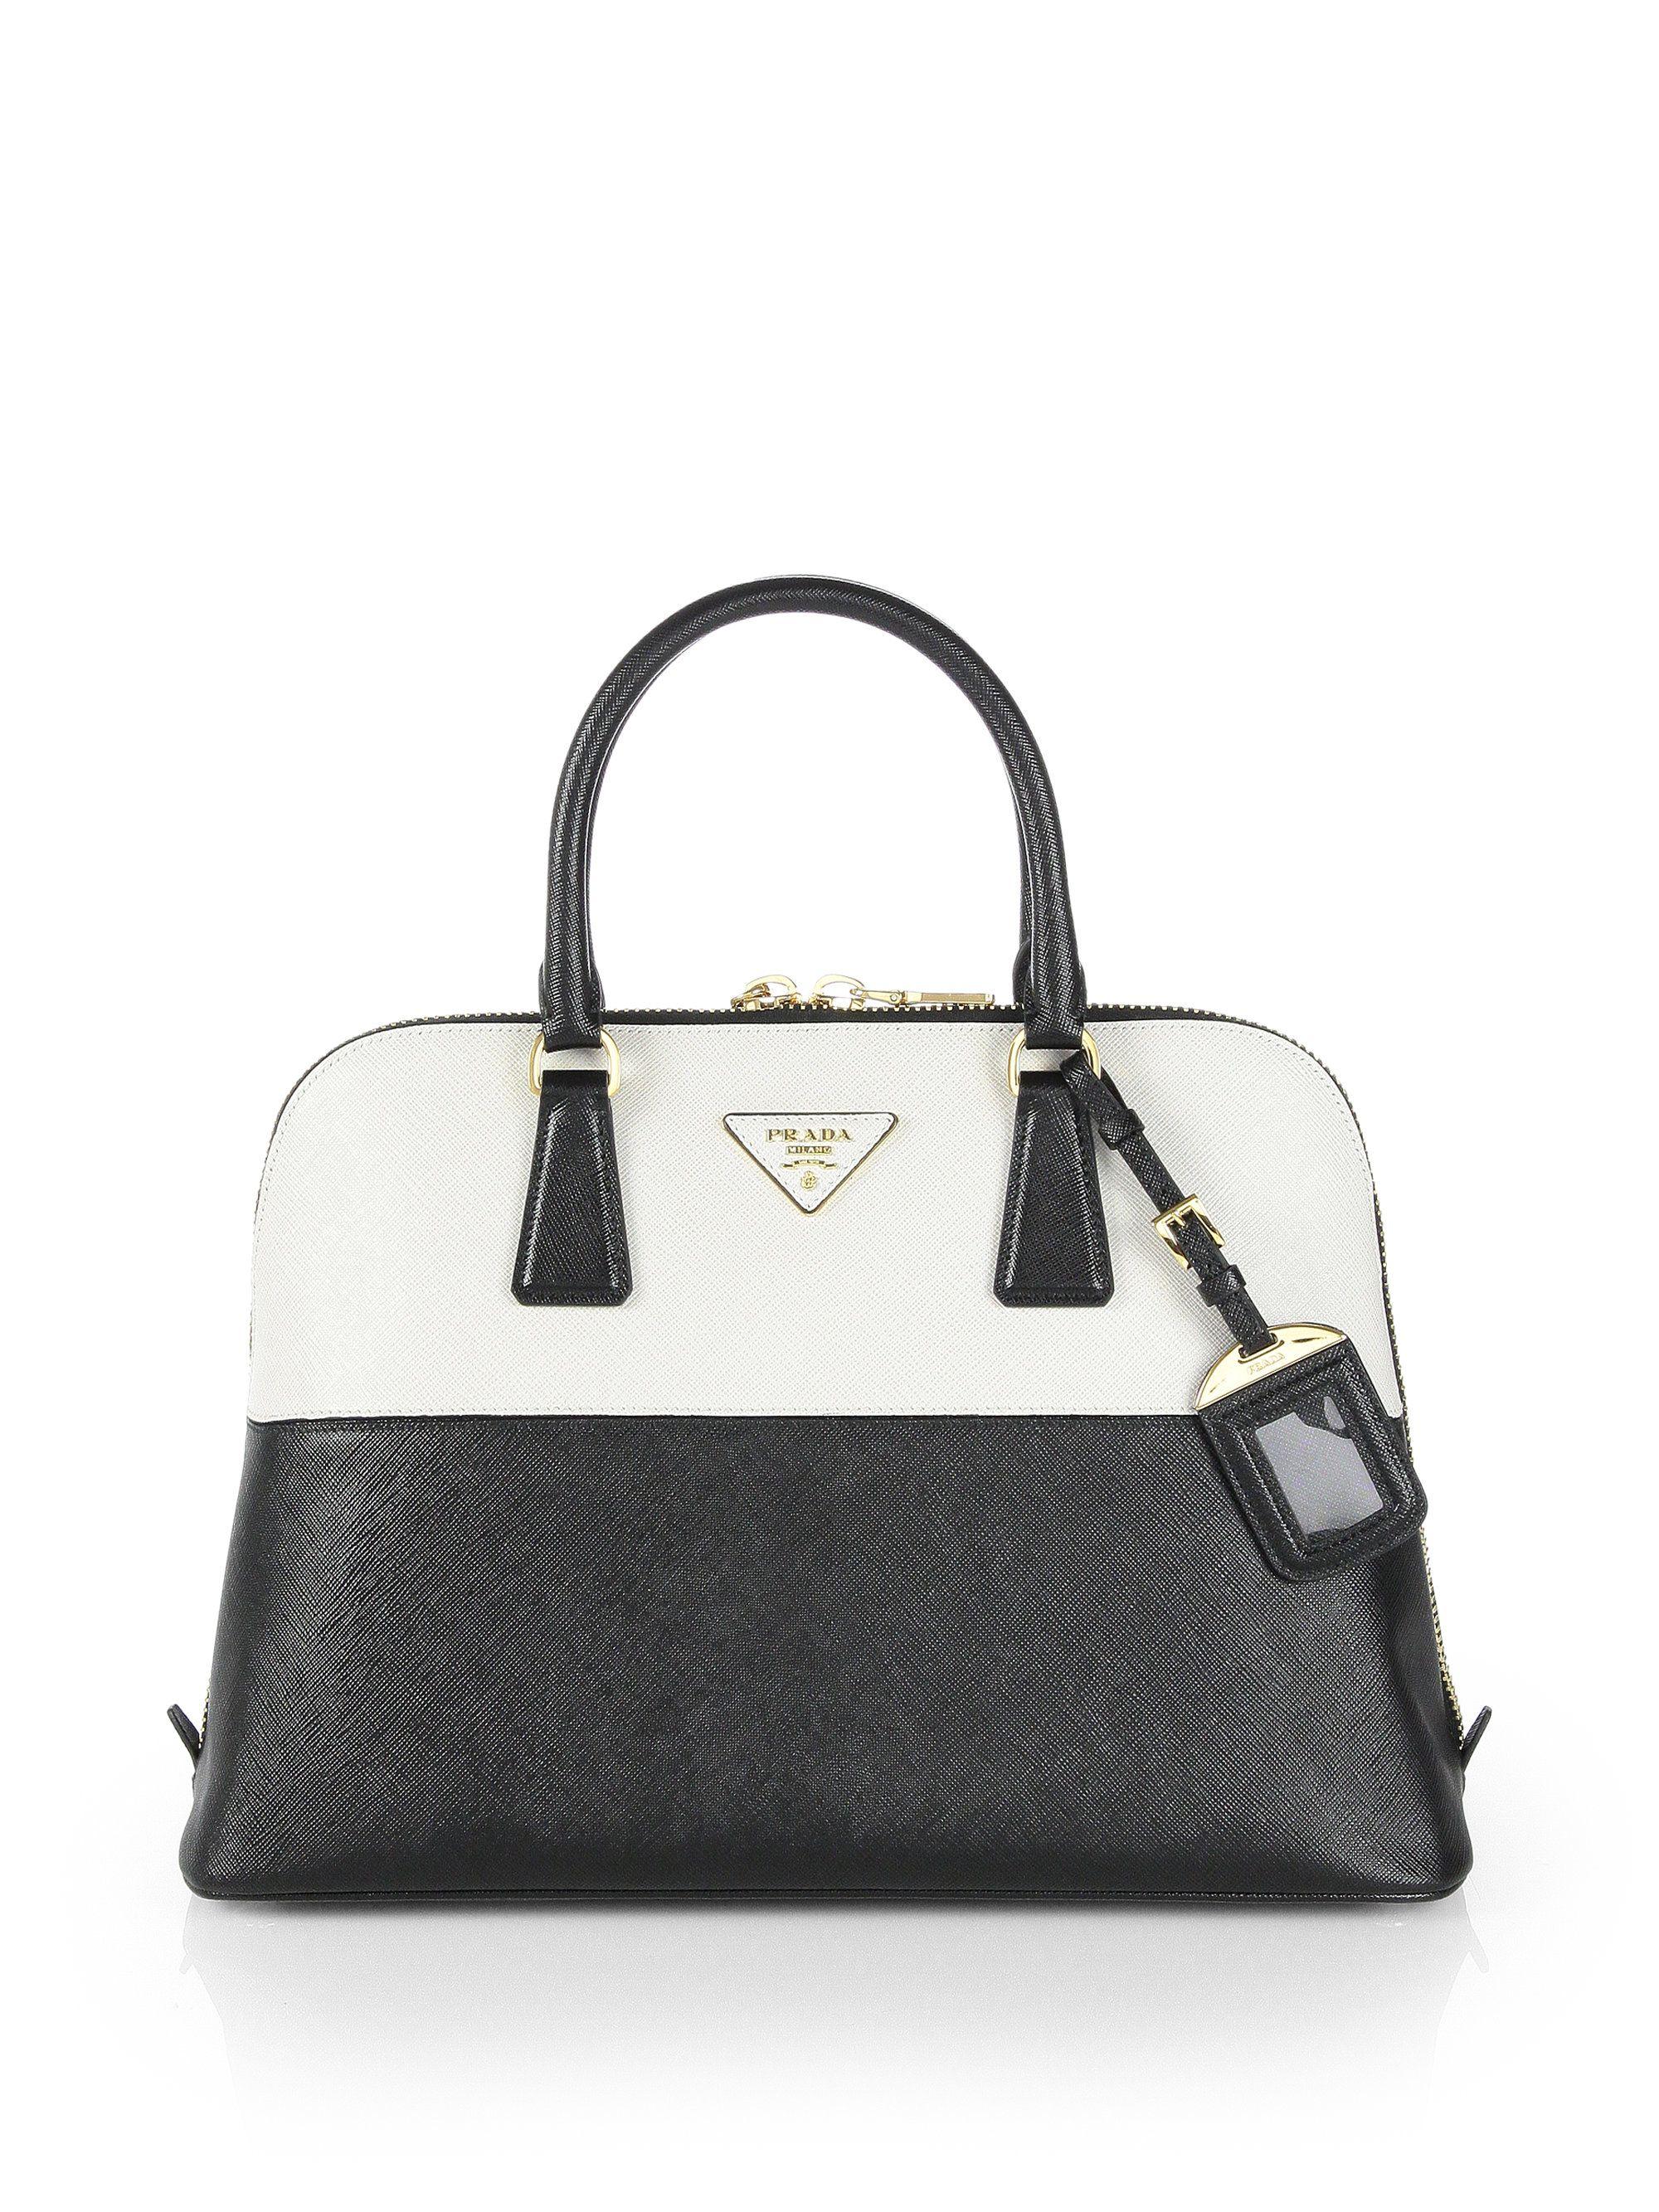 21f89af63732 Prada Saffiano Bicolor Promenade Bag in Black (nero-black) | Lyst ...